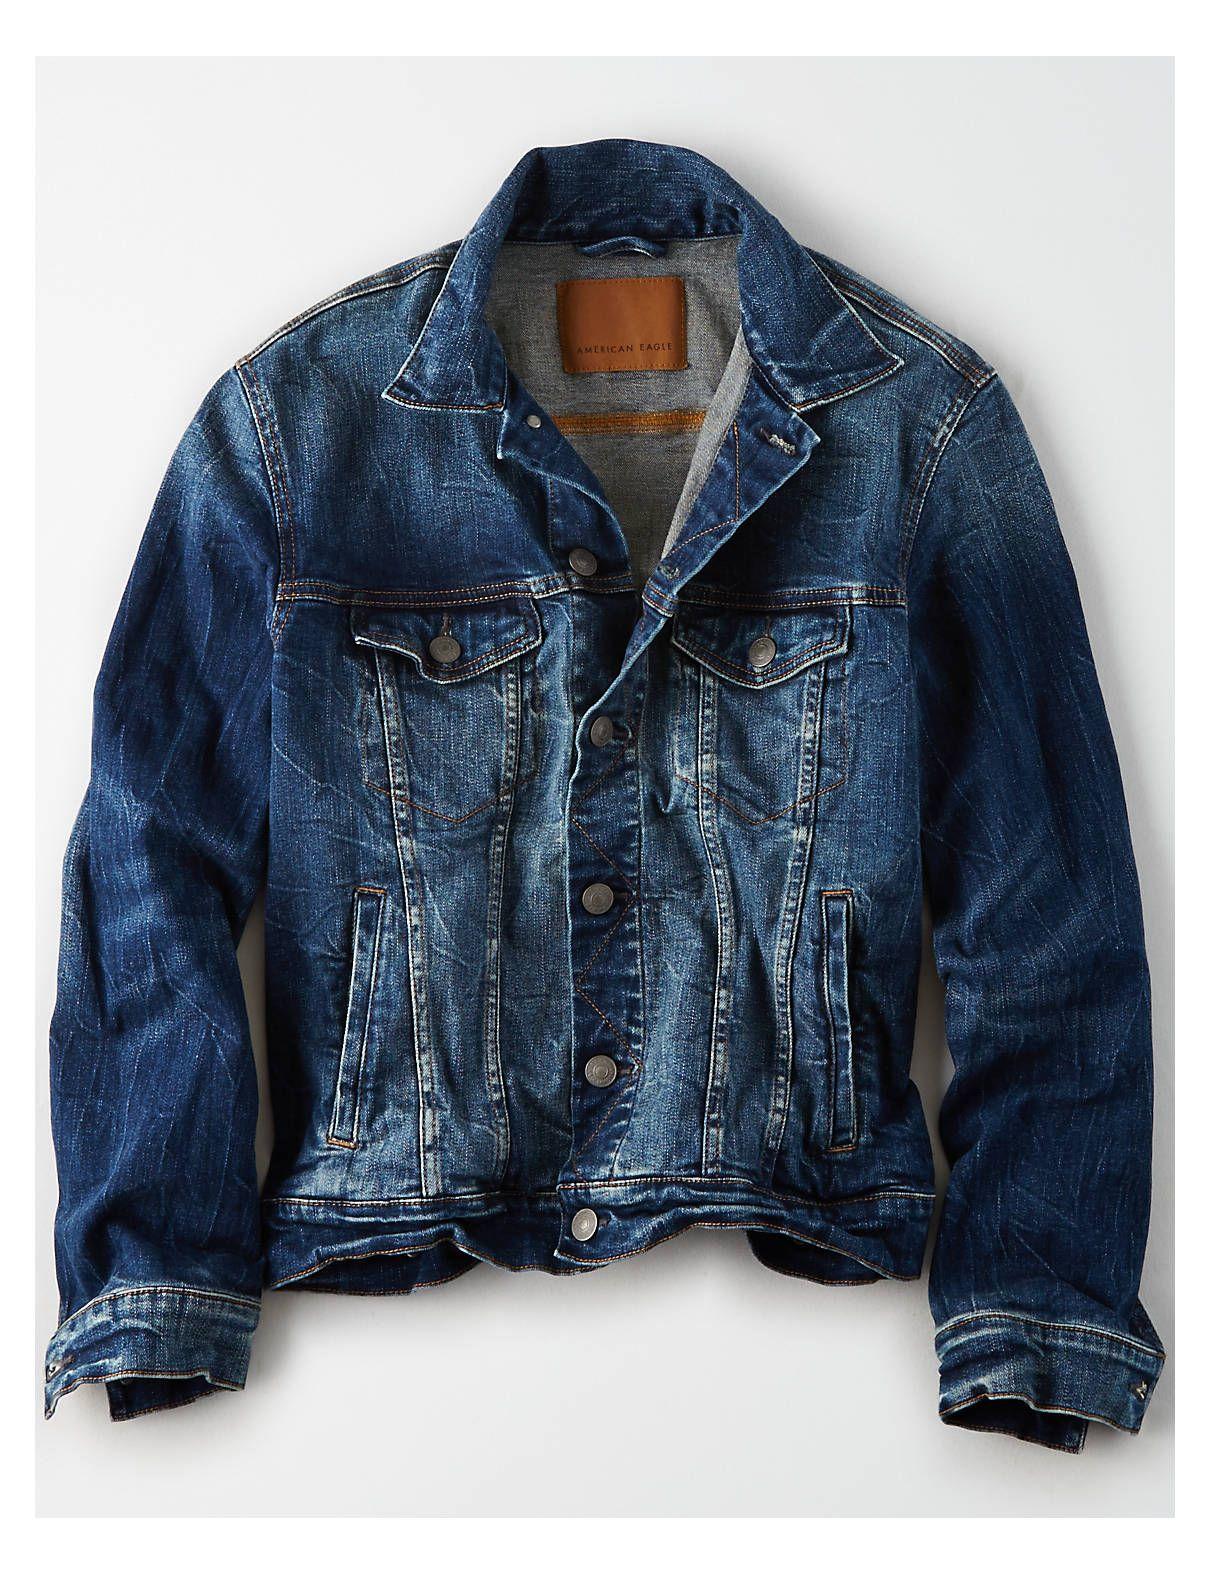 Ae Dark Wash Jean Jacket Washed Blue American Eagle Outfitters Dark Wash Denim Jacket Jean Jacket Men Denim Jacket Women [ 1575 x 1211 Pixel ]